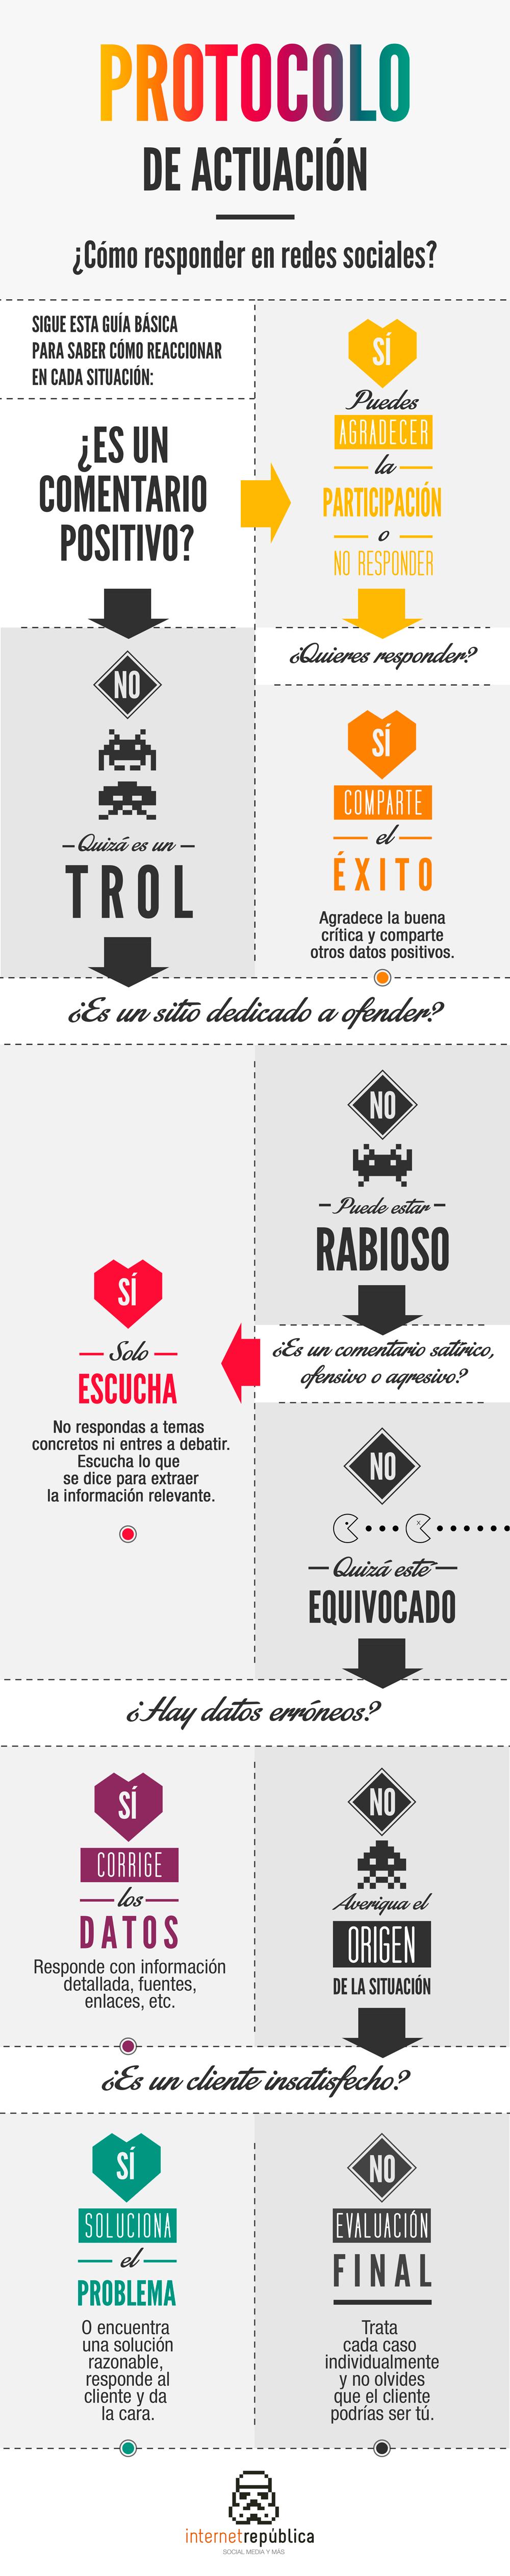 Protocolo redes sociales infografia